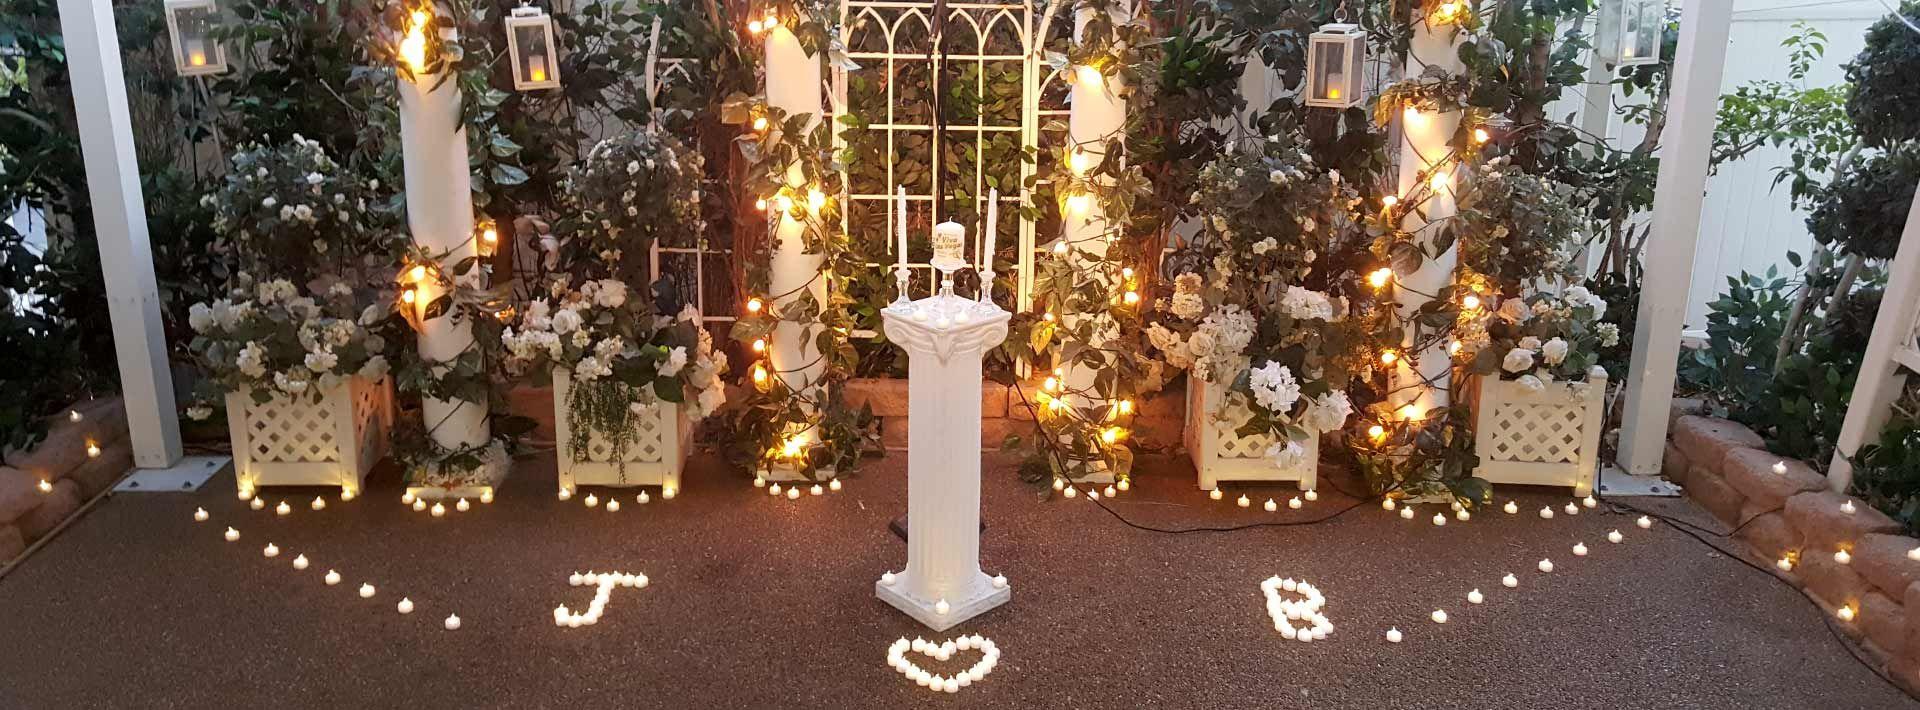 The Garden Chapel At Viva Las Vegas Wedding Chapel Las Vegas Wedding Chapel Vegas Wedding Chapel Vegas Wedding